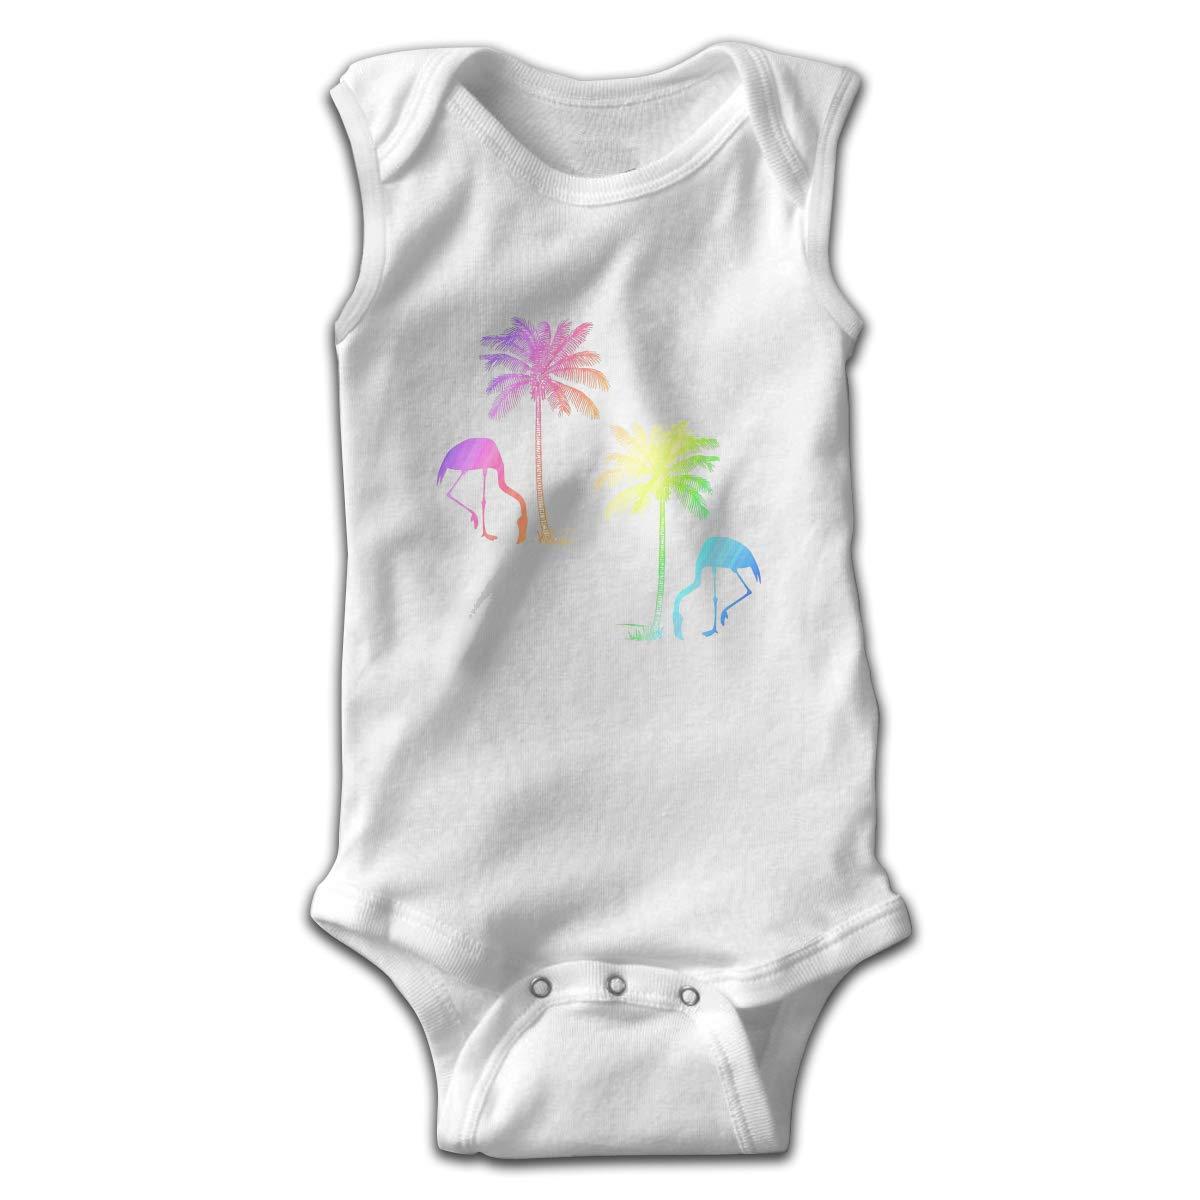 Coconut Trees and Flamingos Newborn Crawling Suit Sleeveless Romper Bodysuit Onesies Jumpsuit Black